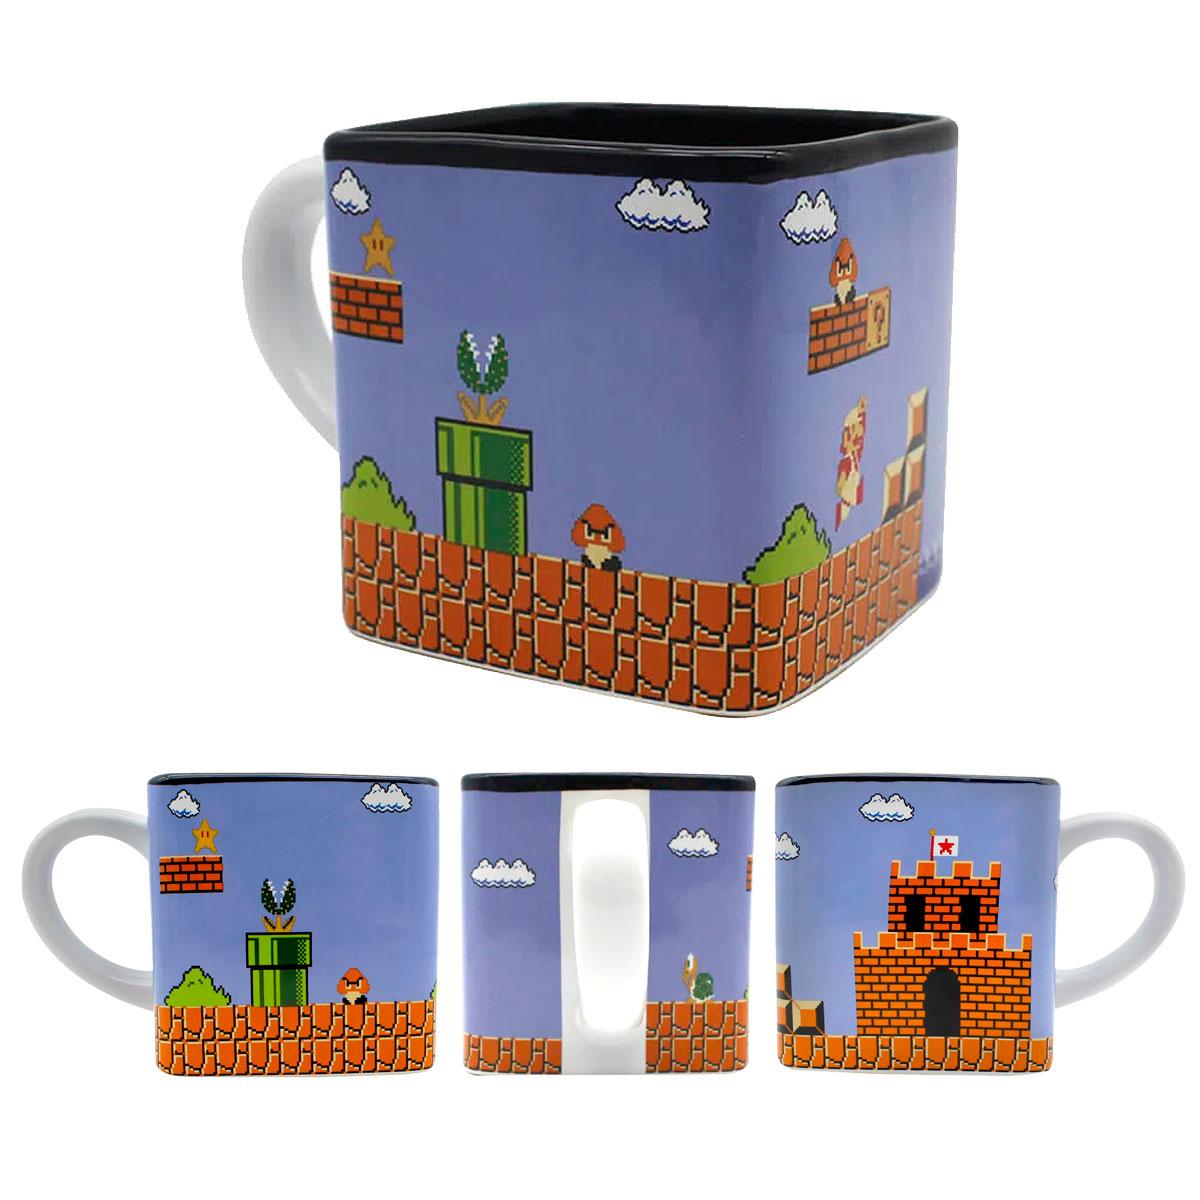 Caneca Quadrada Cubo Mario Fases Pixel - Presente Super